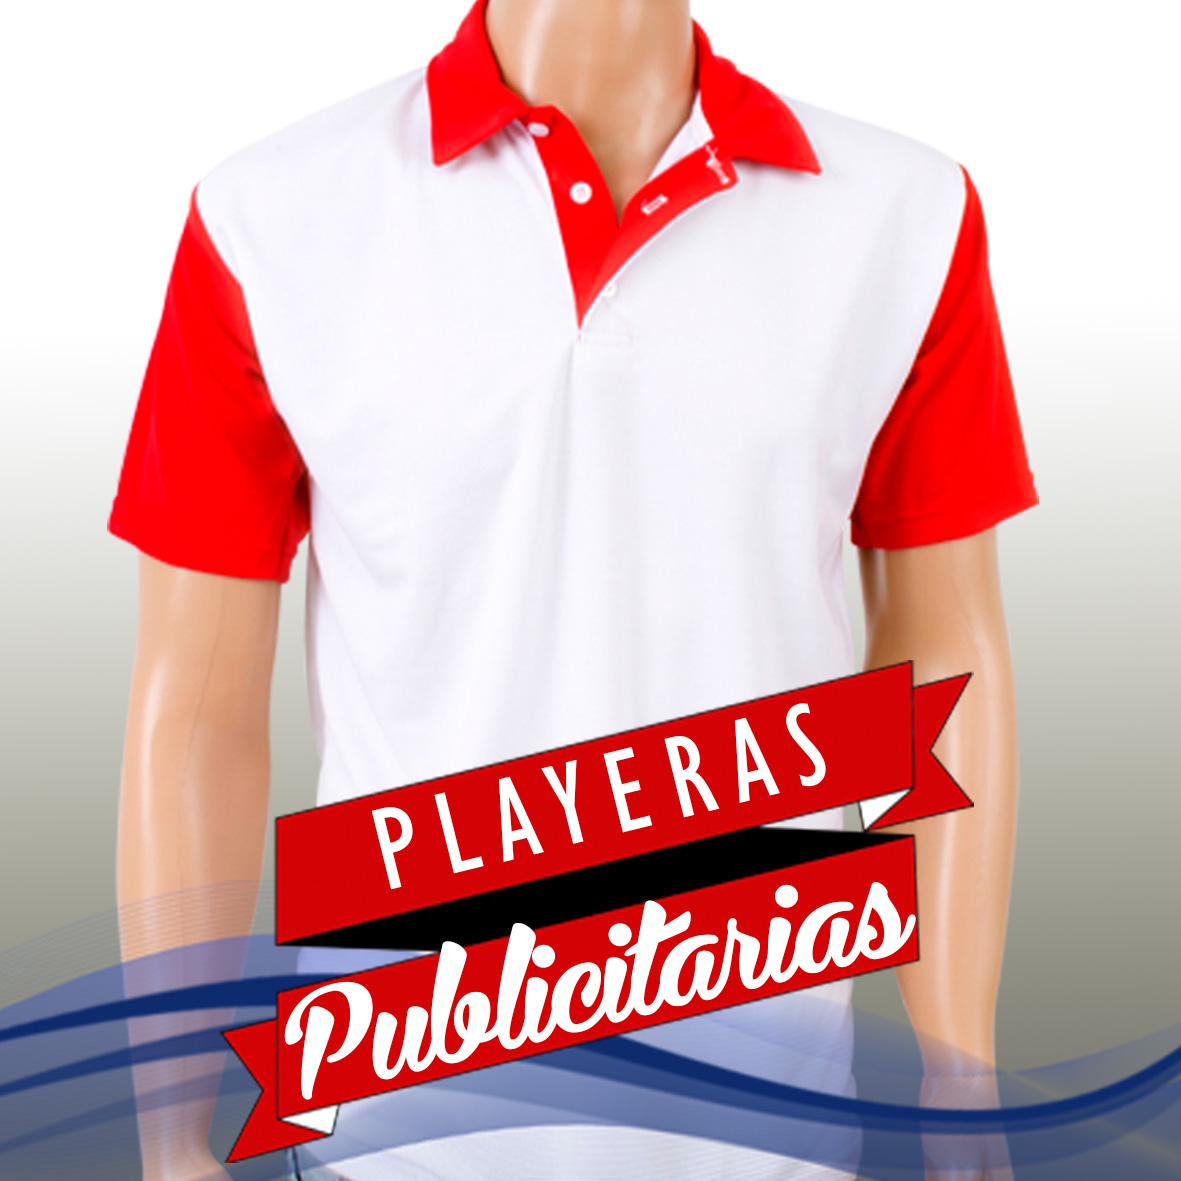 Playeras Publicitarias